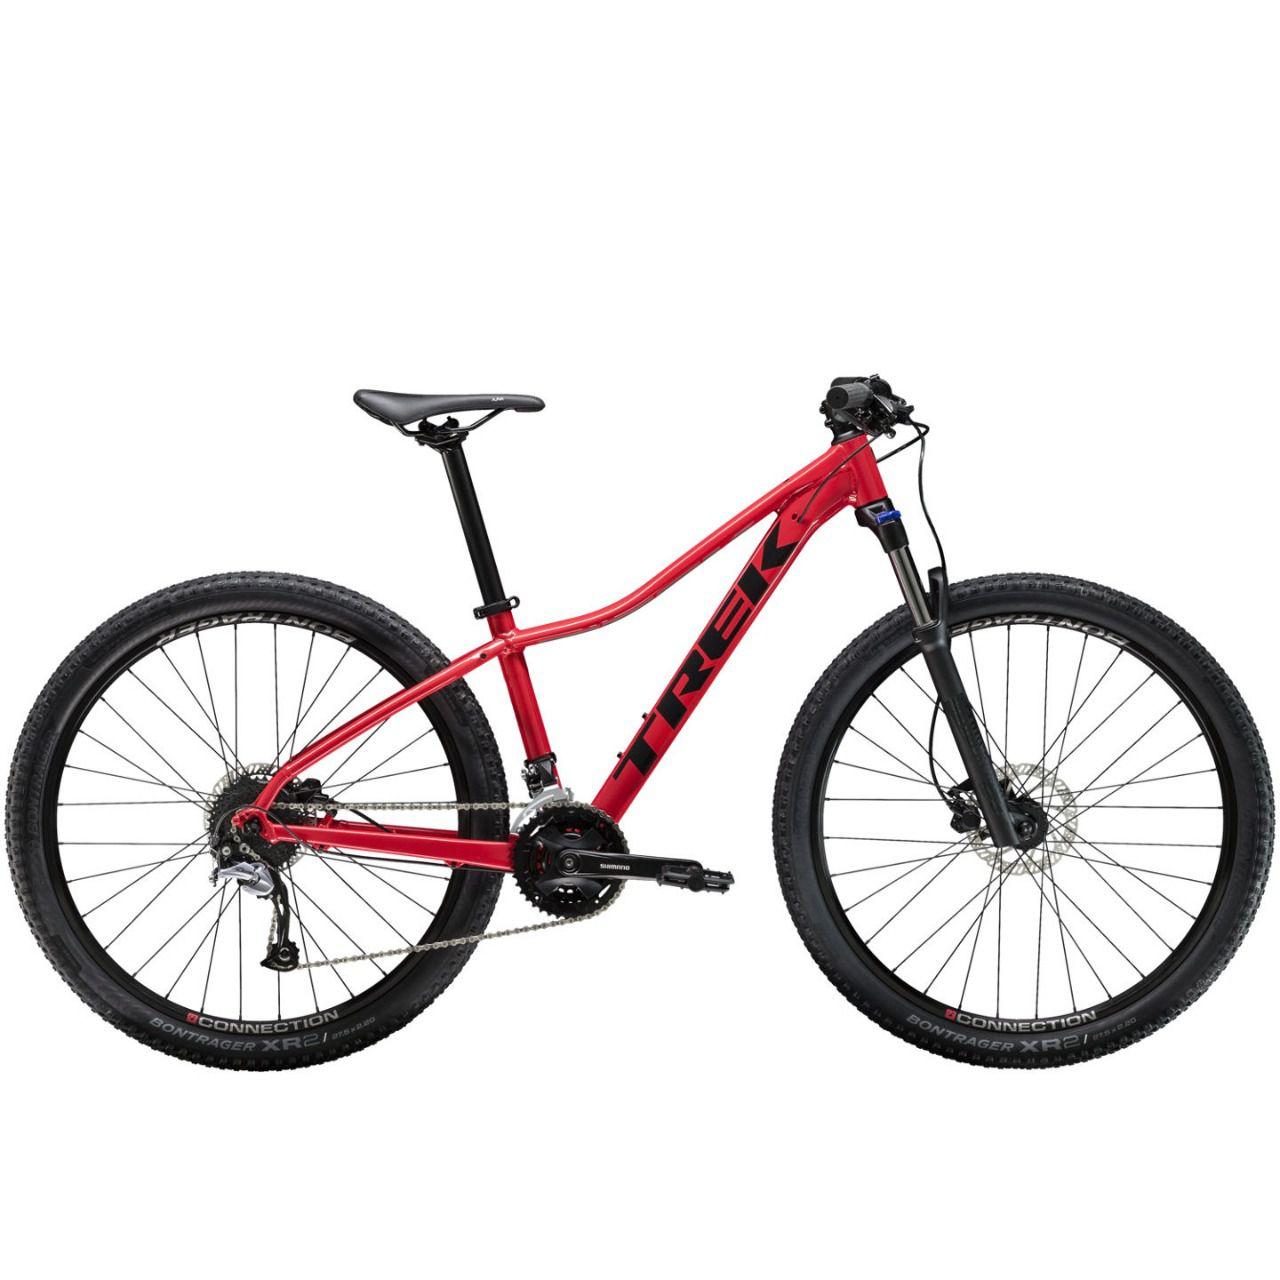 Bicicleta Trek Marlin 7  - 2018 - R$ 4.490,00